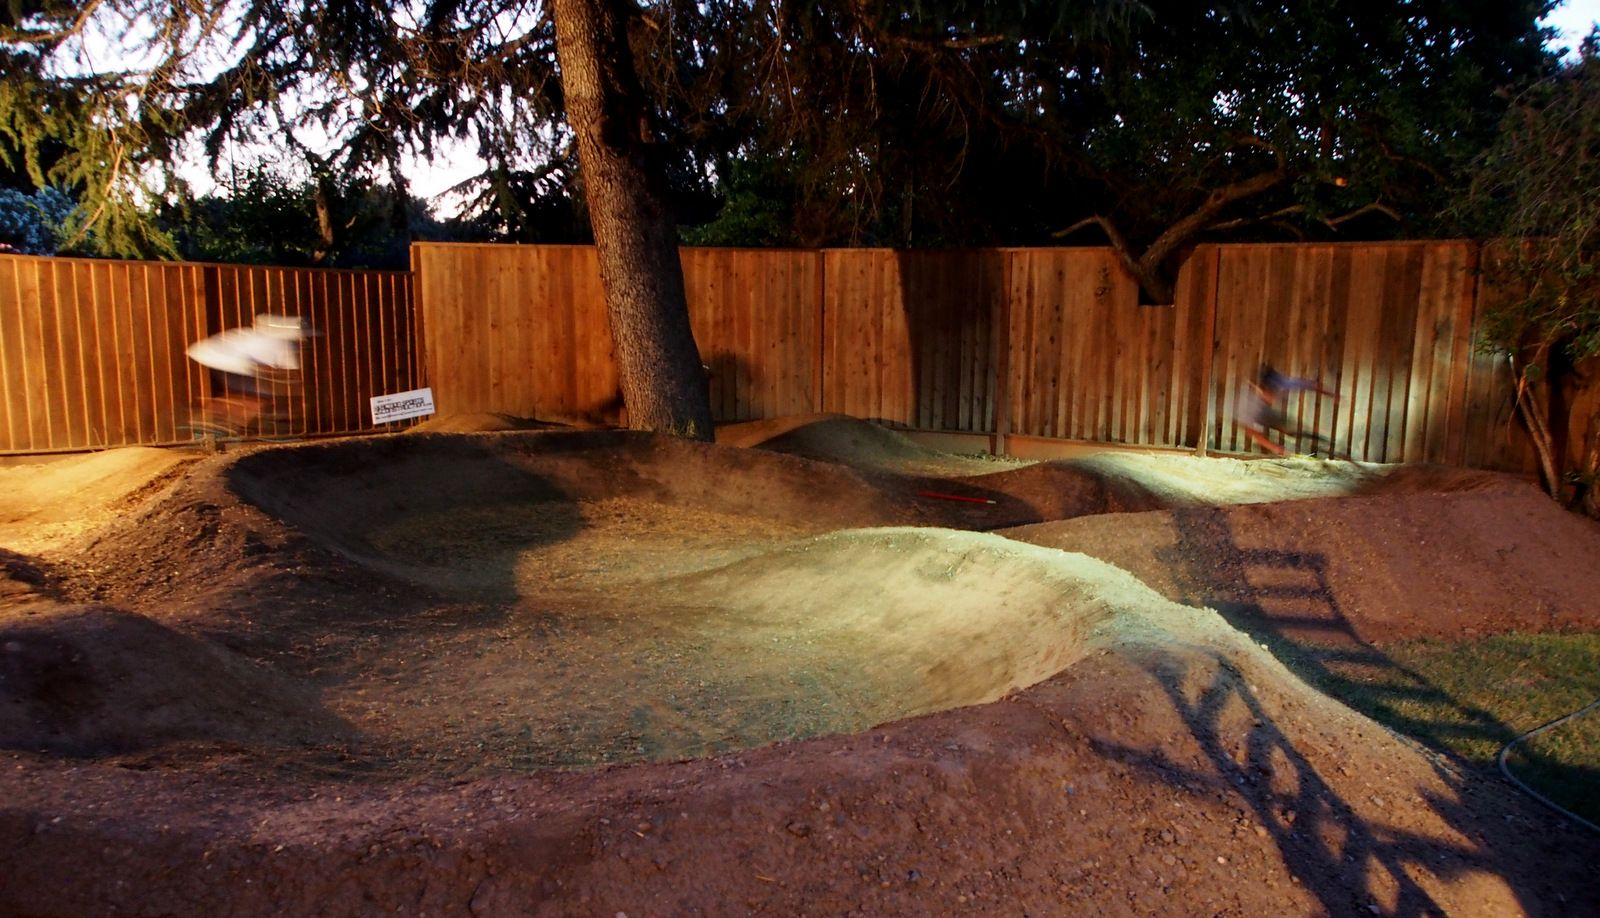 backyard pump track at night pump track pinterest backyard